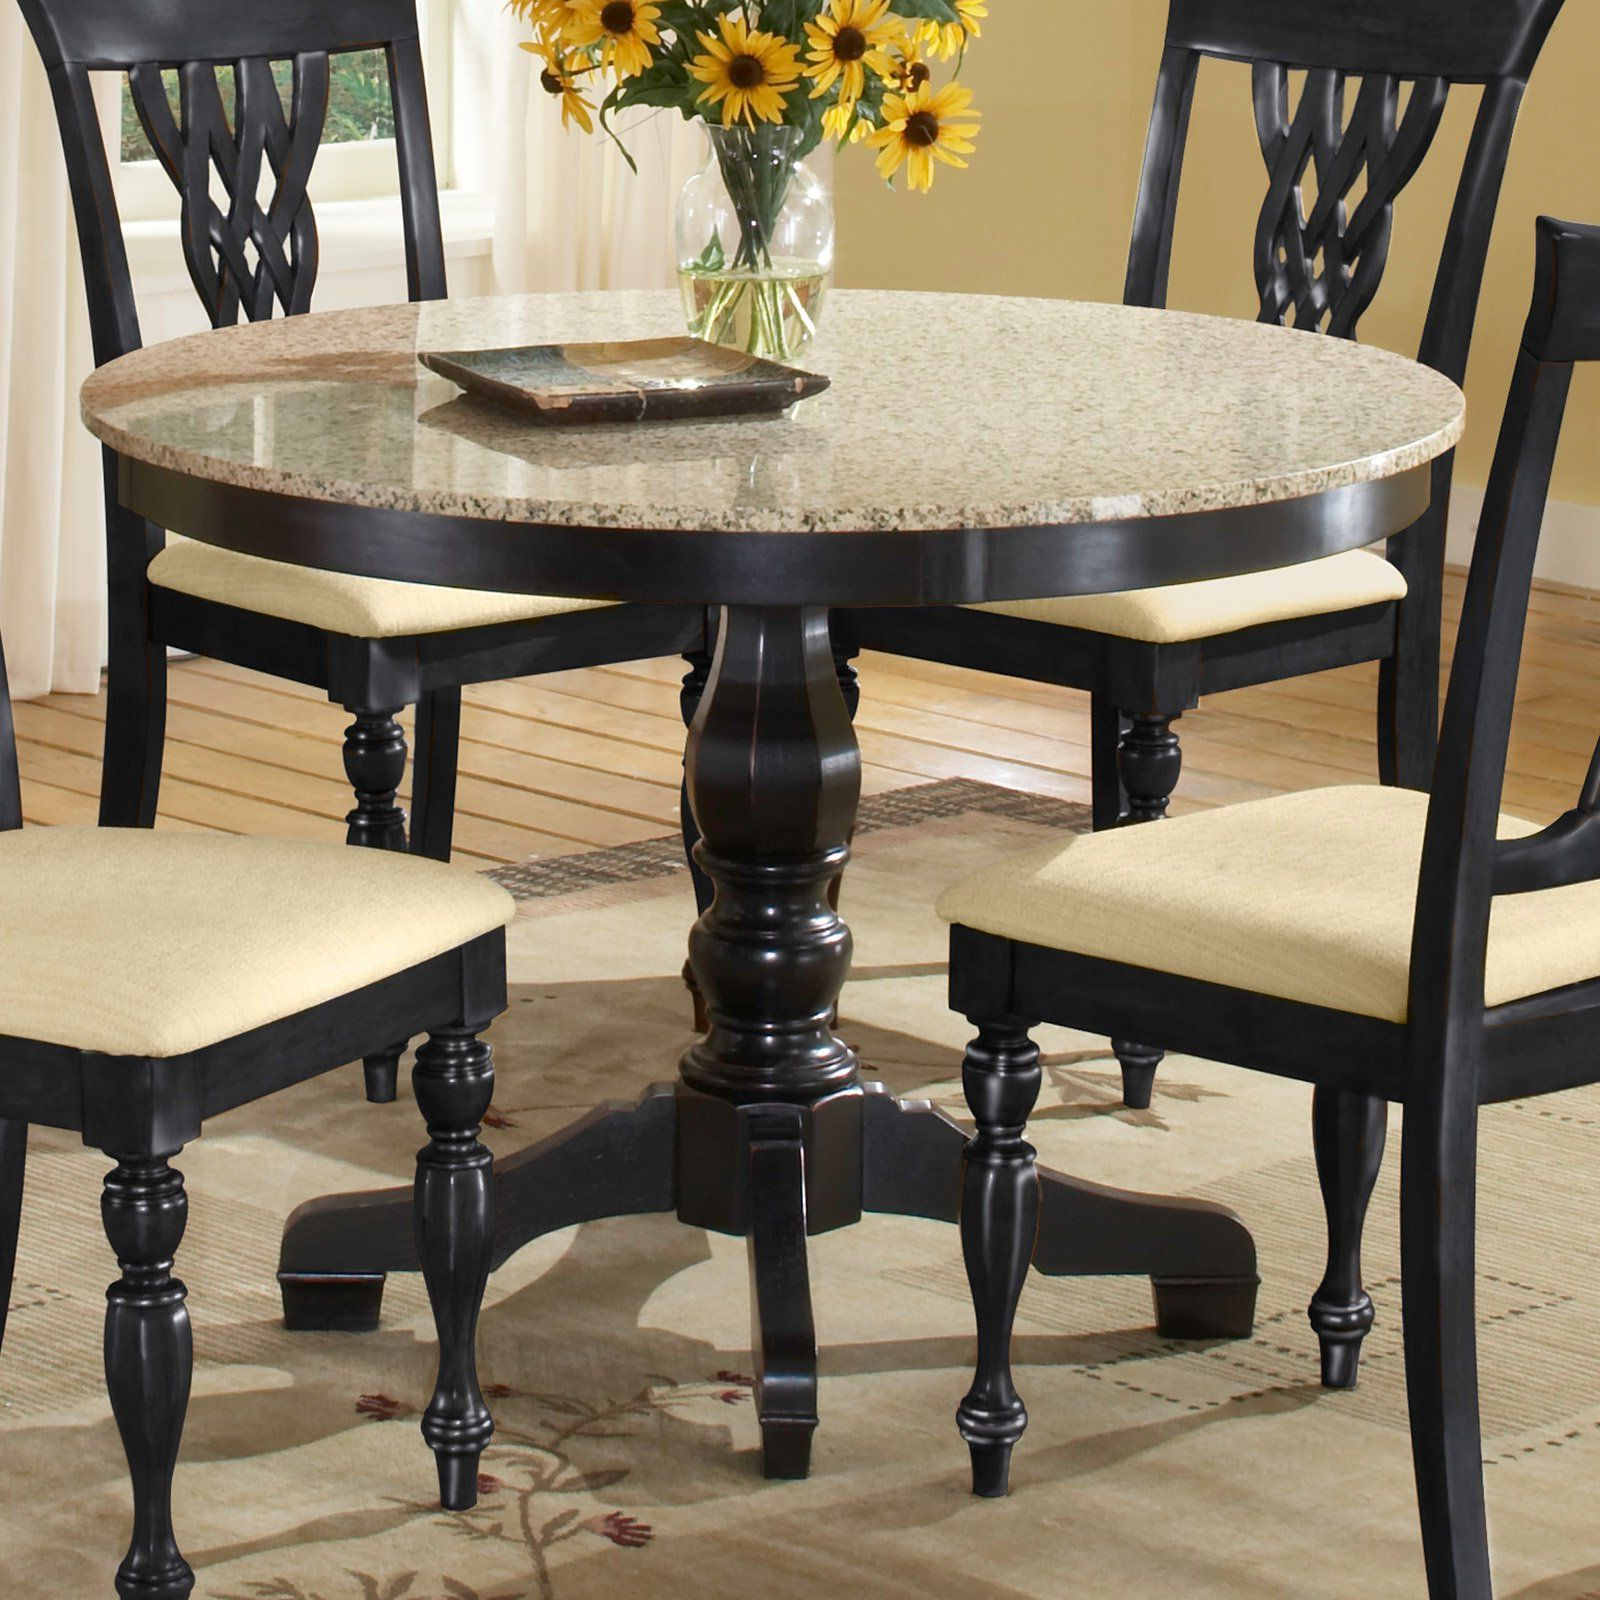 Most Recent Johnson Round Pedestal Dining Tables Pertaining To Embassy Round Pedestal Table With 42 Inch Granite Top Black (View 5 of 25)